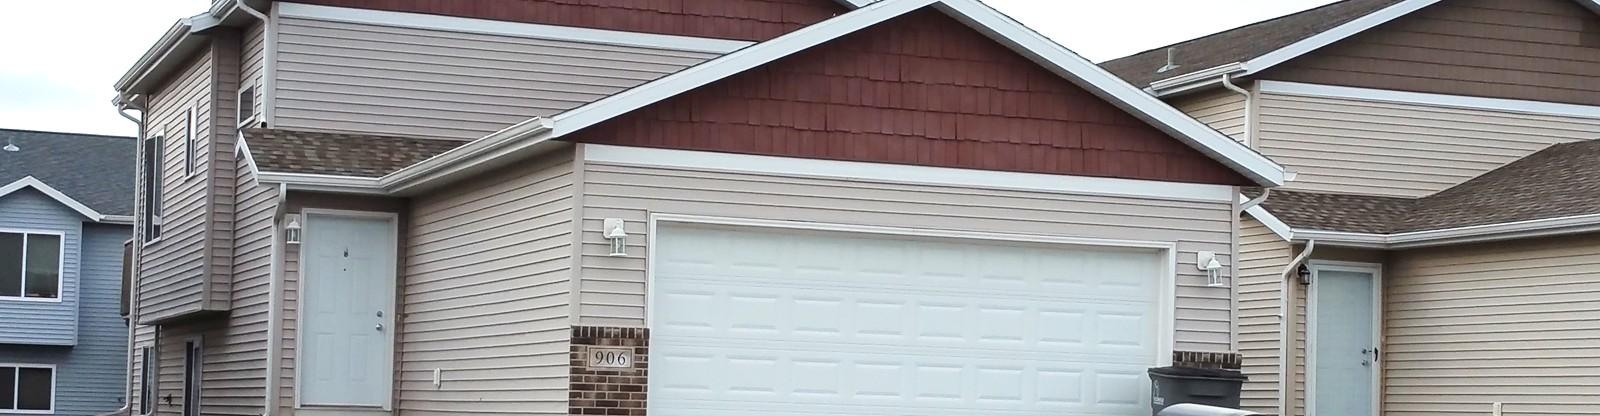 Rent Fargo Apartment Rent Moorhead Apartment Rkak Property Management